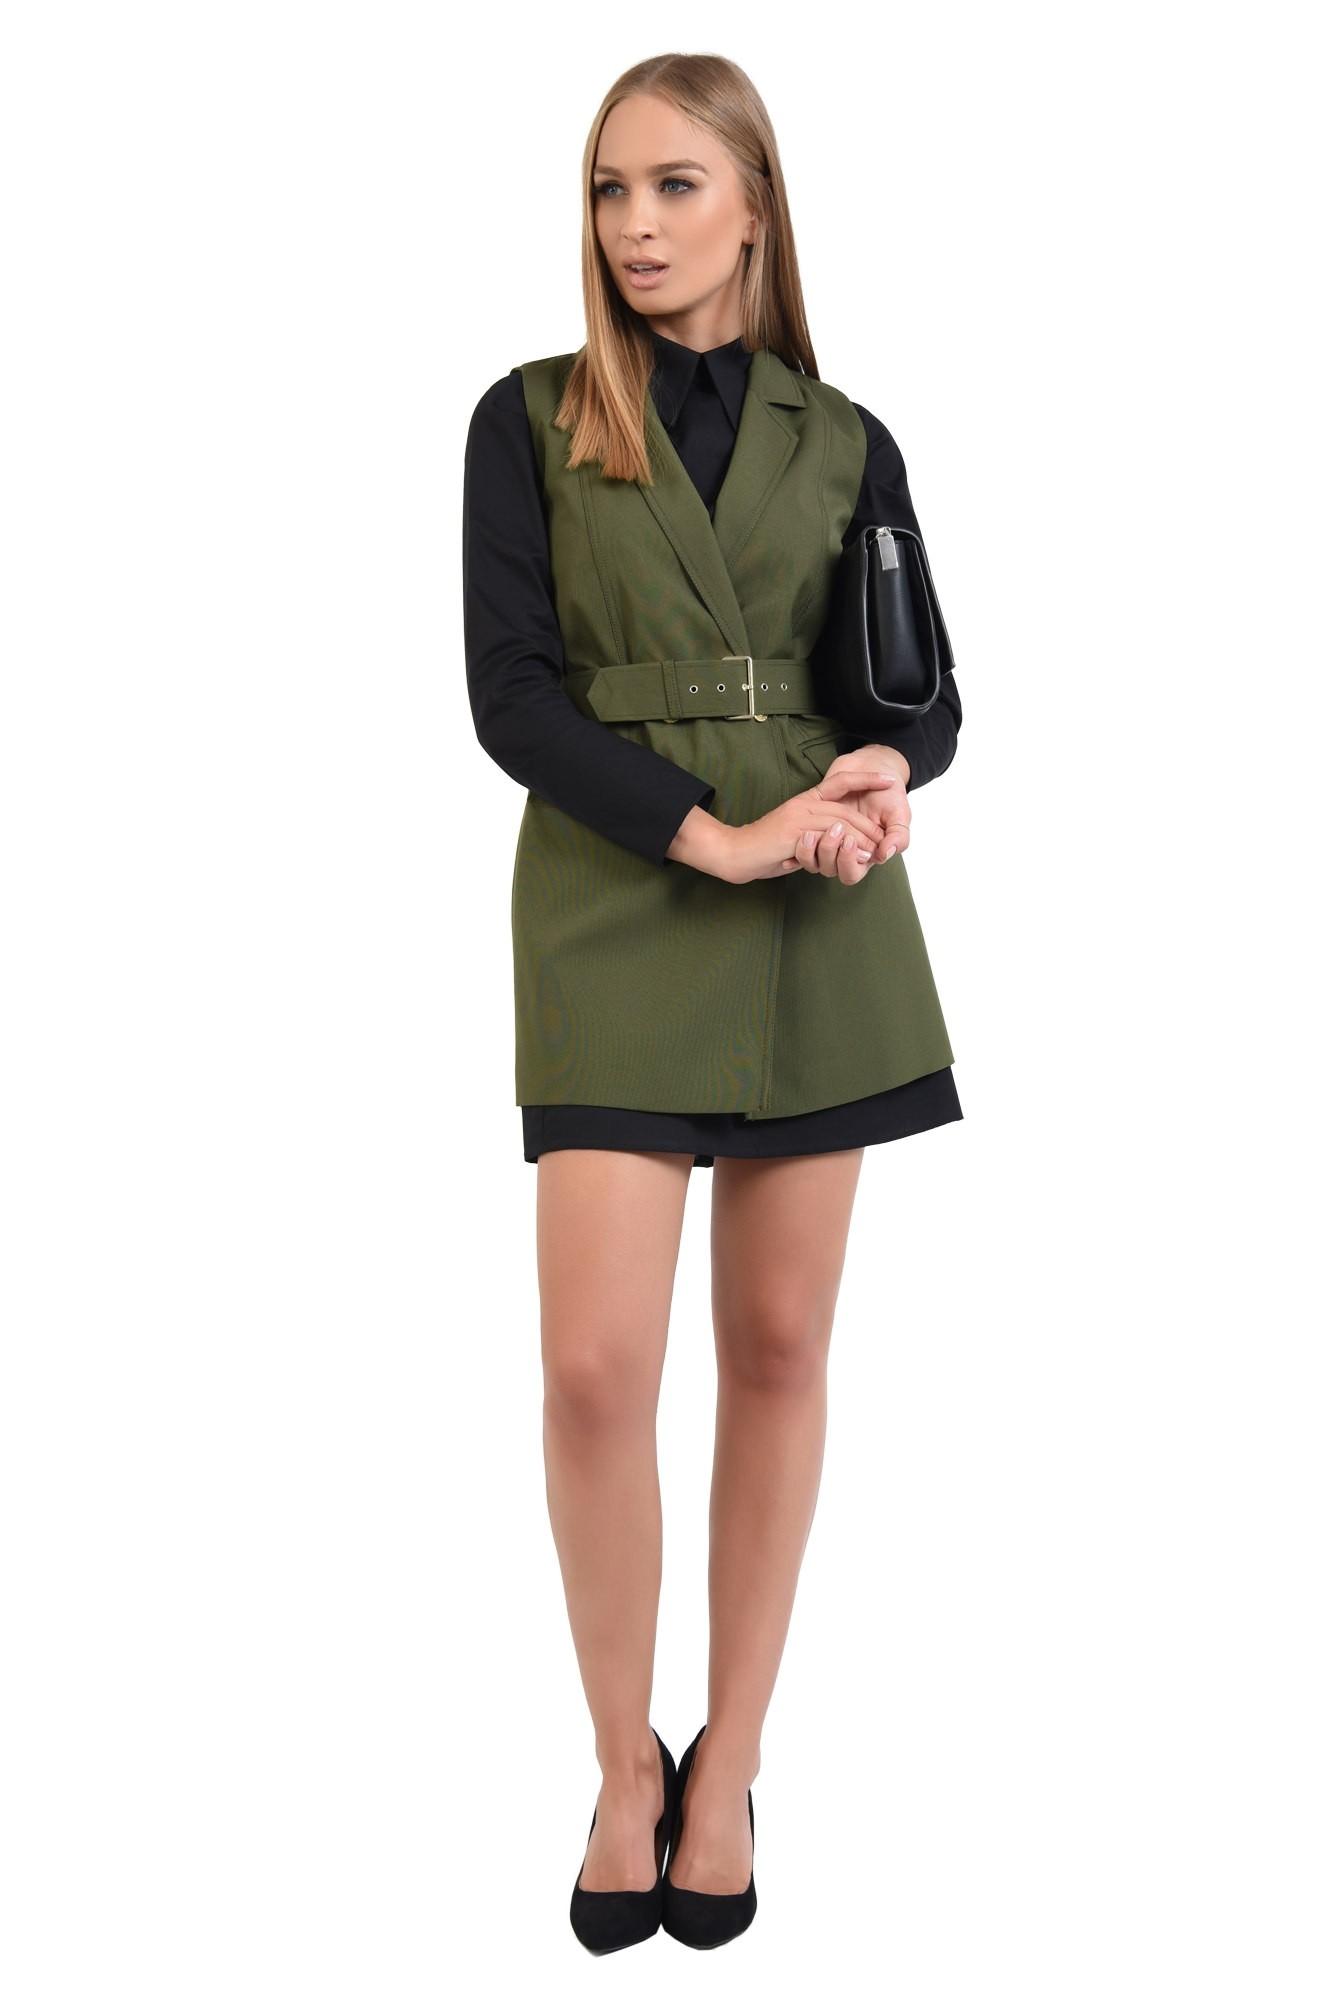 rochie casual, stil camasa, guler ascutit, rochii online